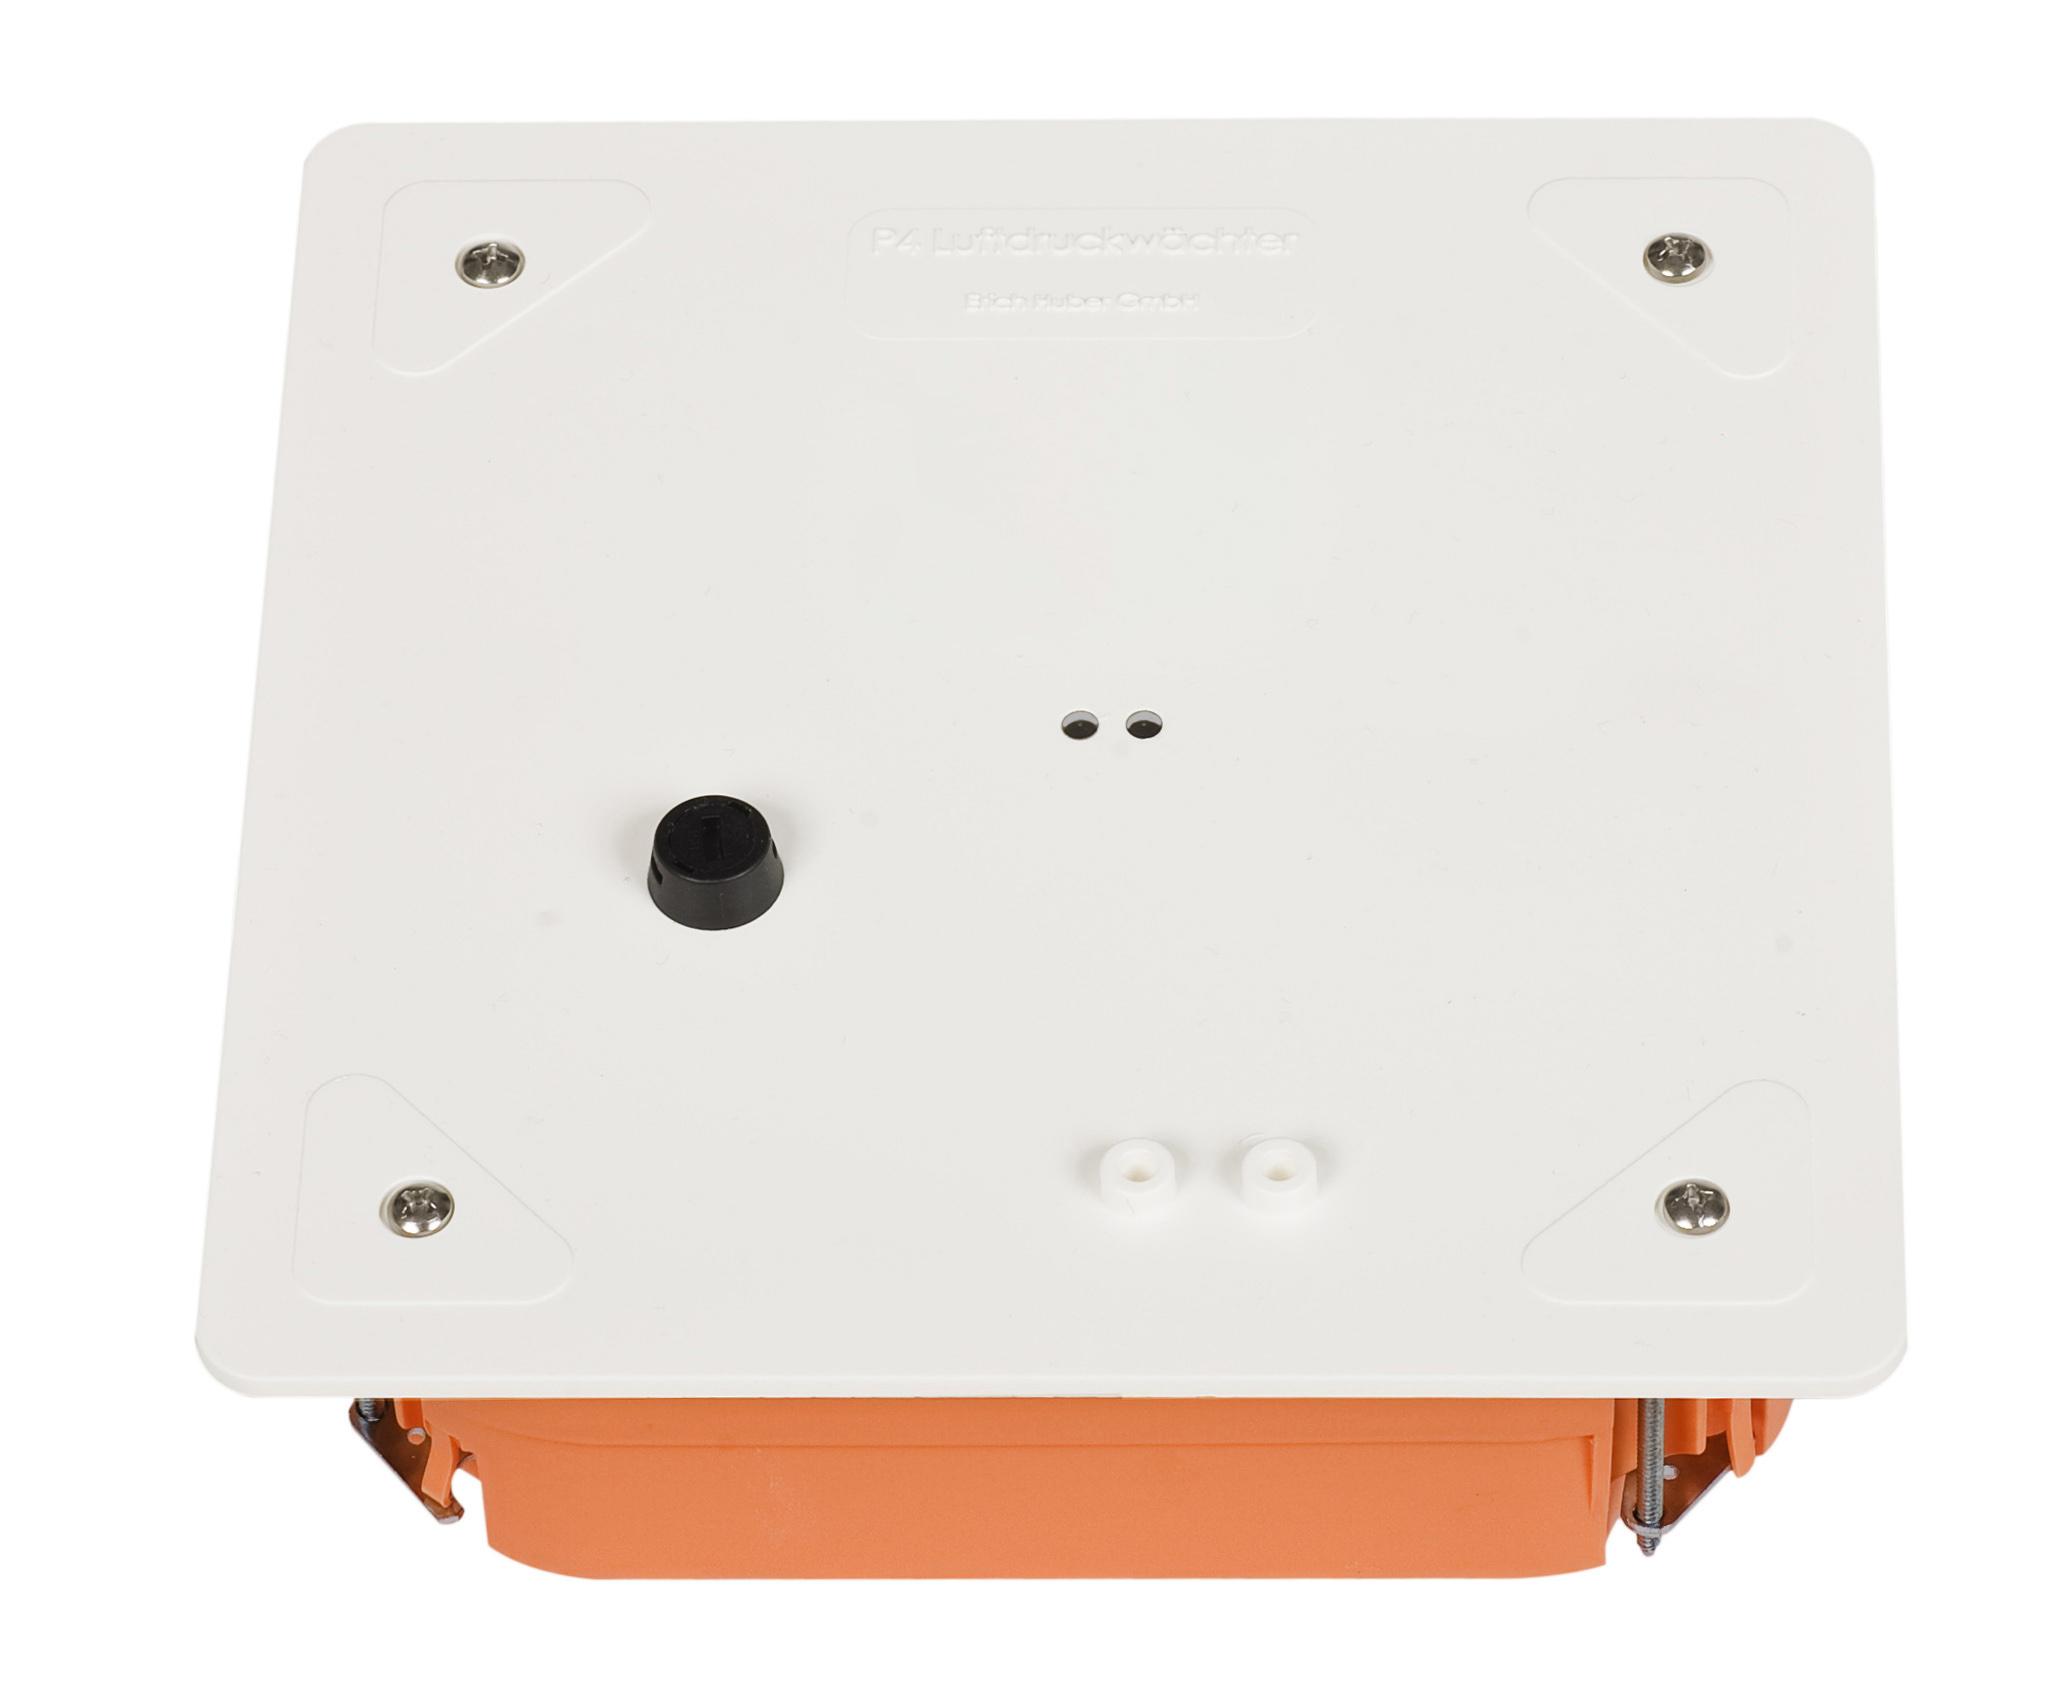 Schlauchstückverlängerung Luftdruckwächter P4 2 Stück